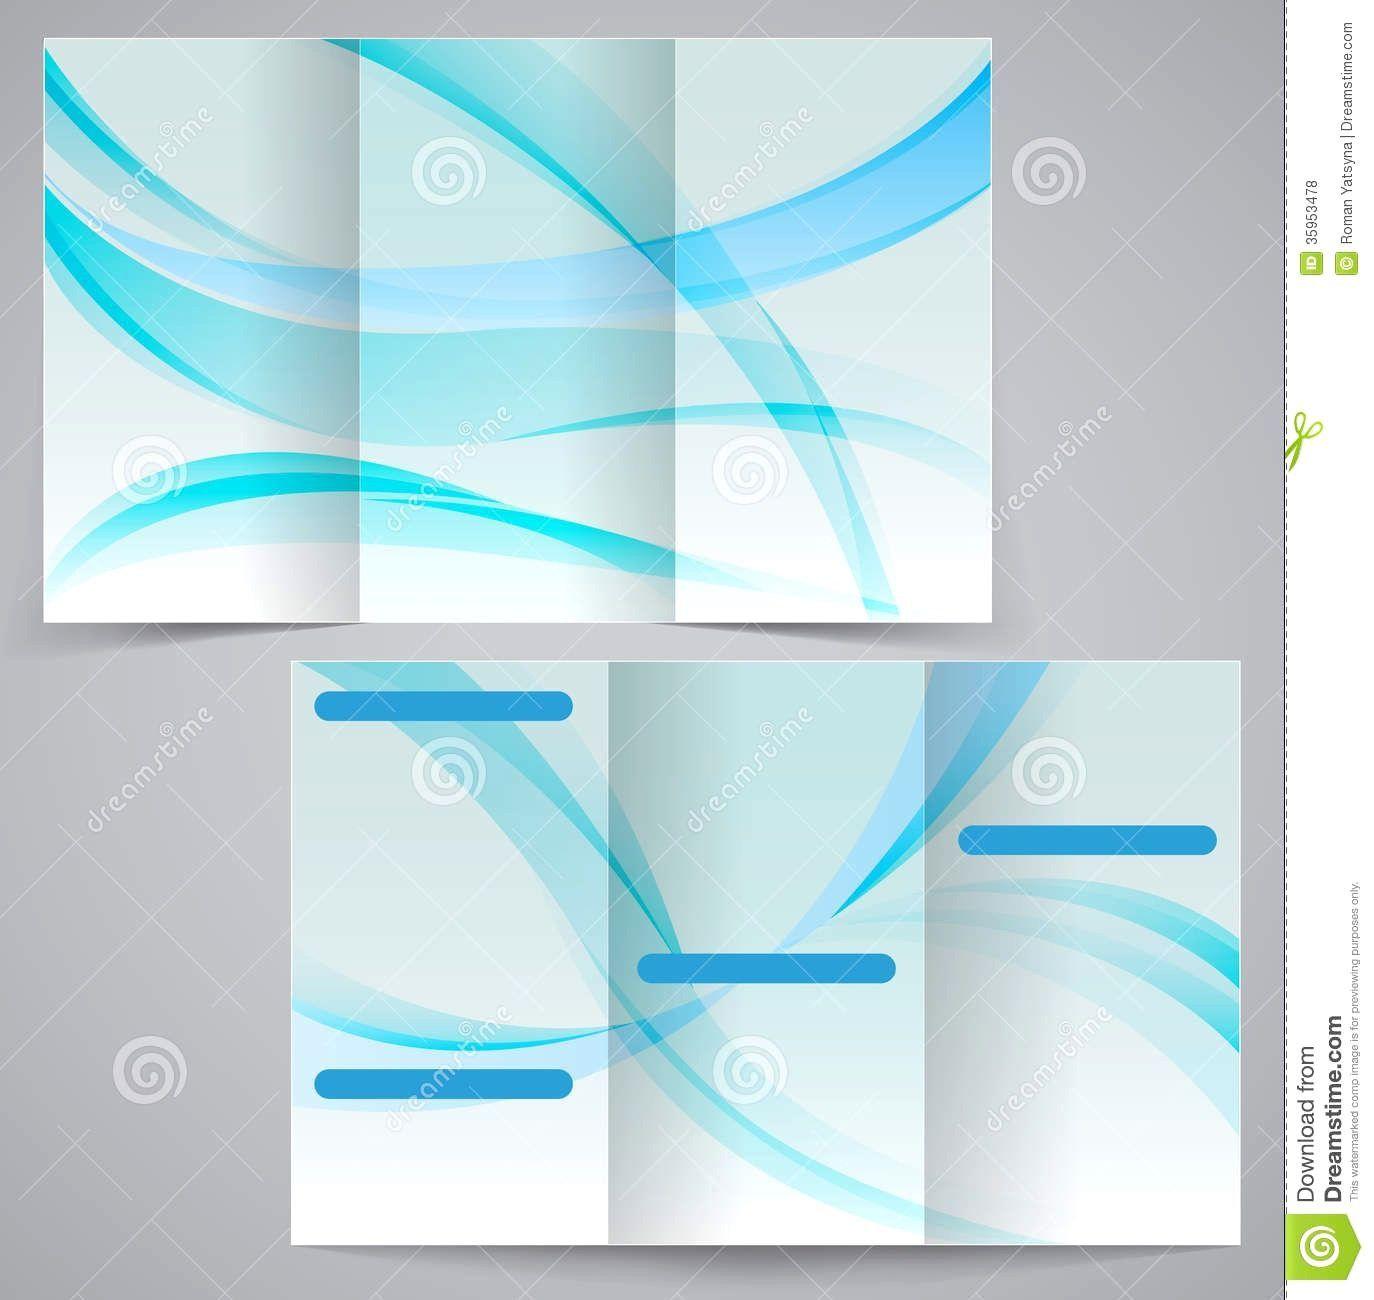 001 Top Download Brochure Template For Word 2007 Sample Full